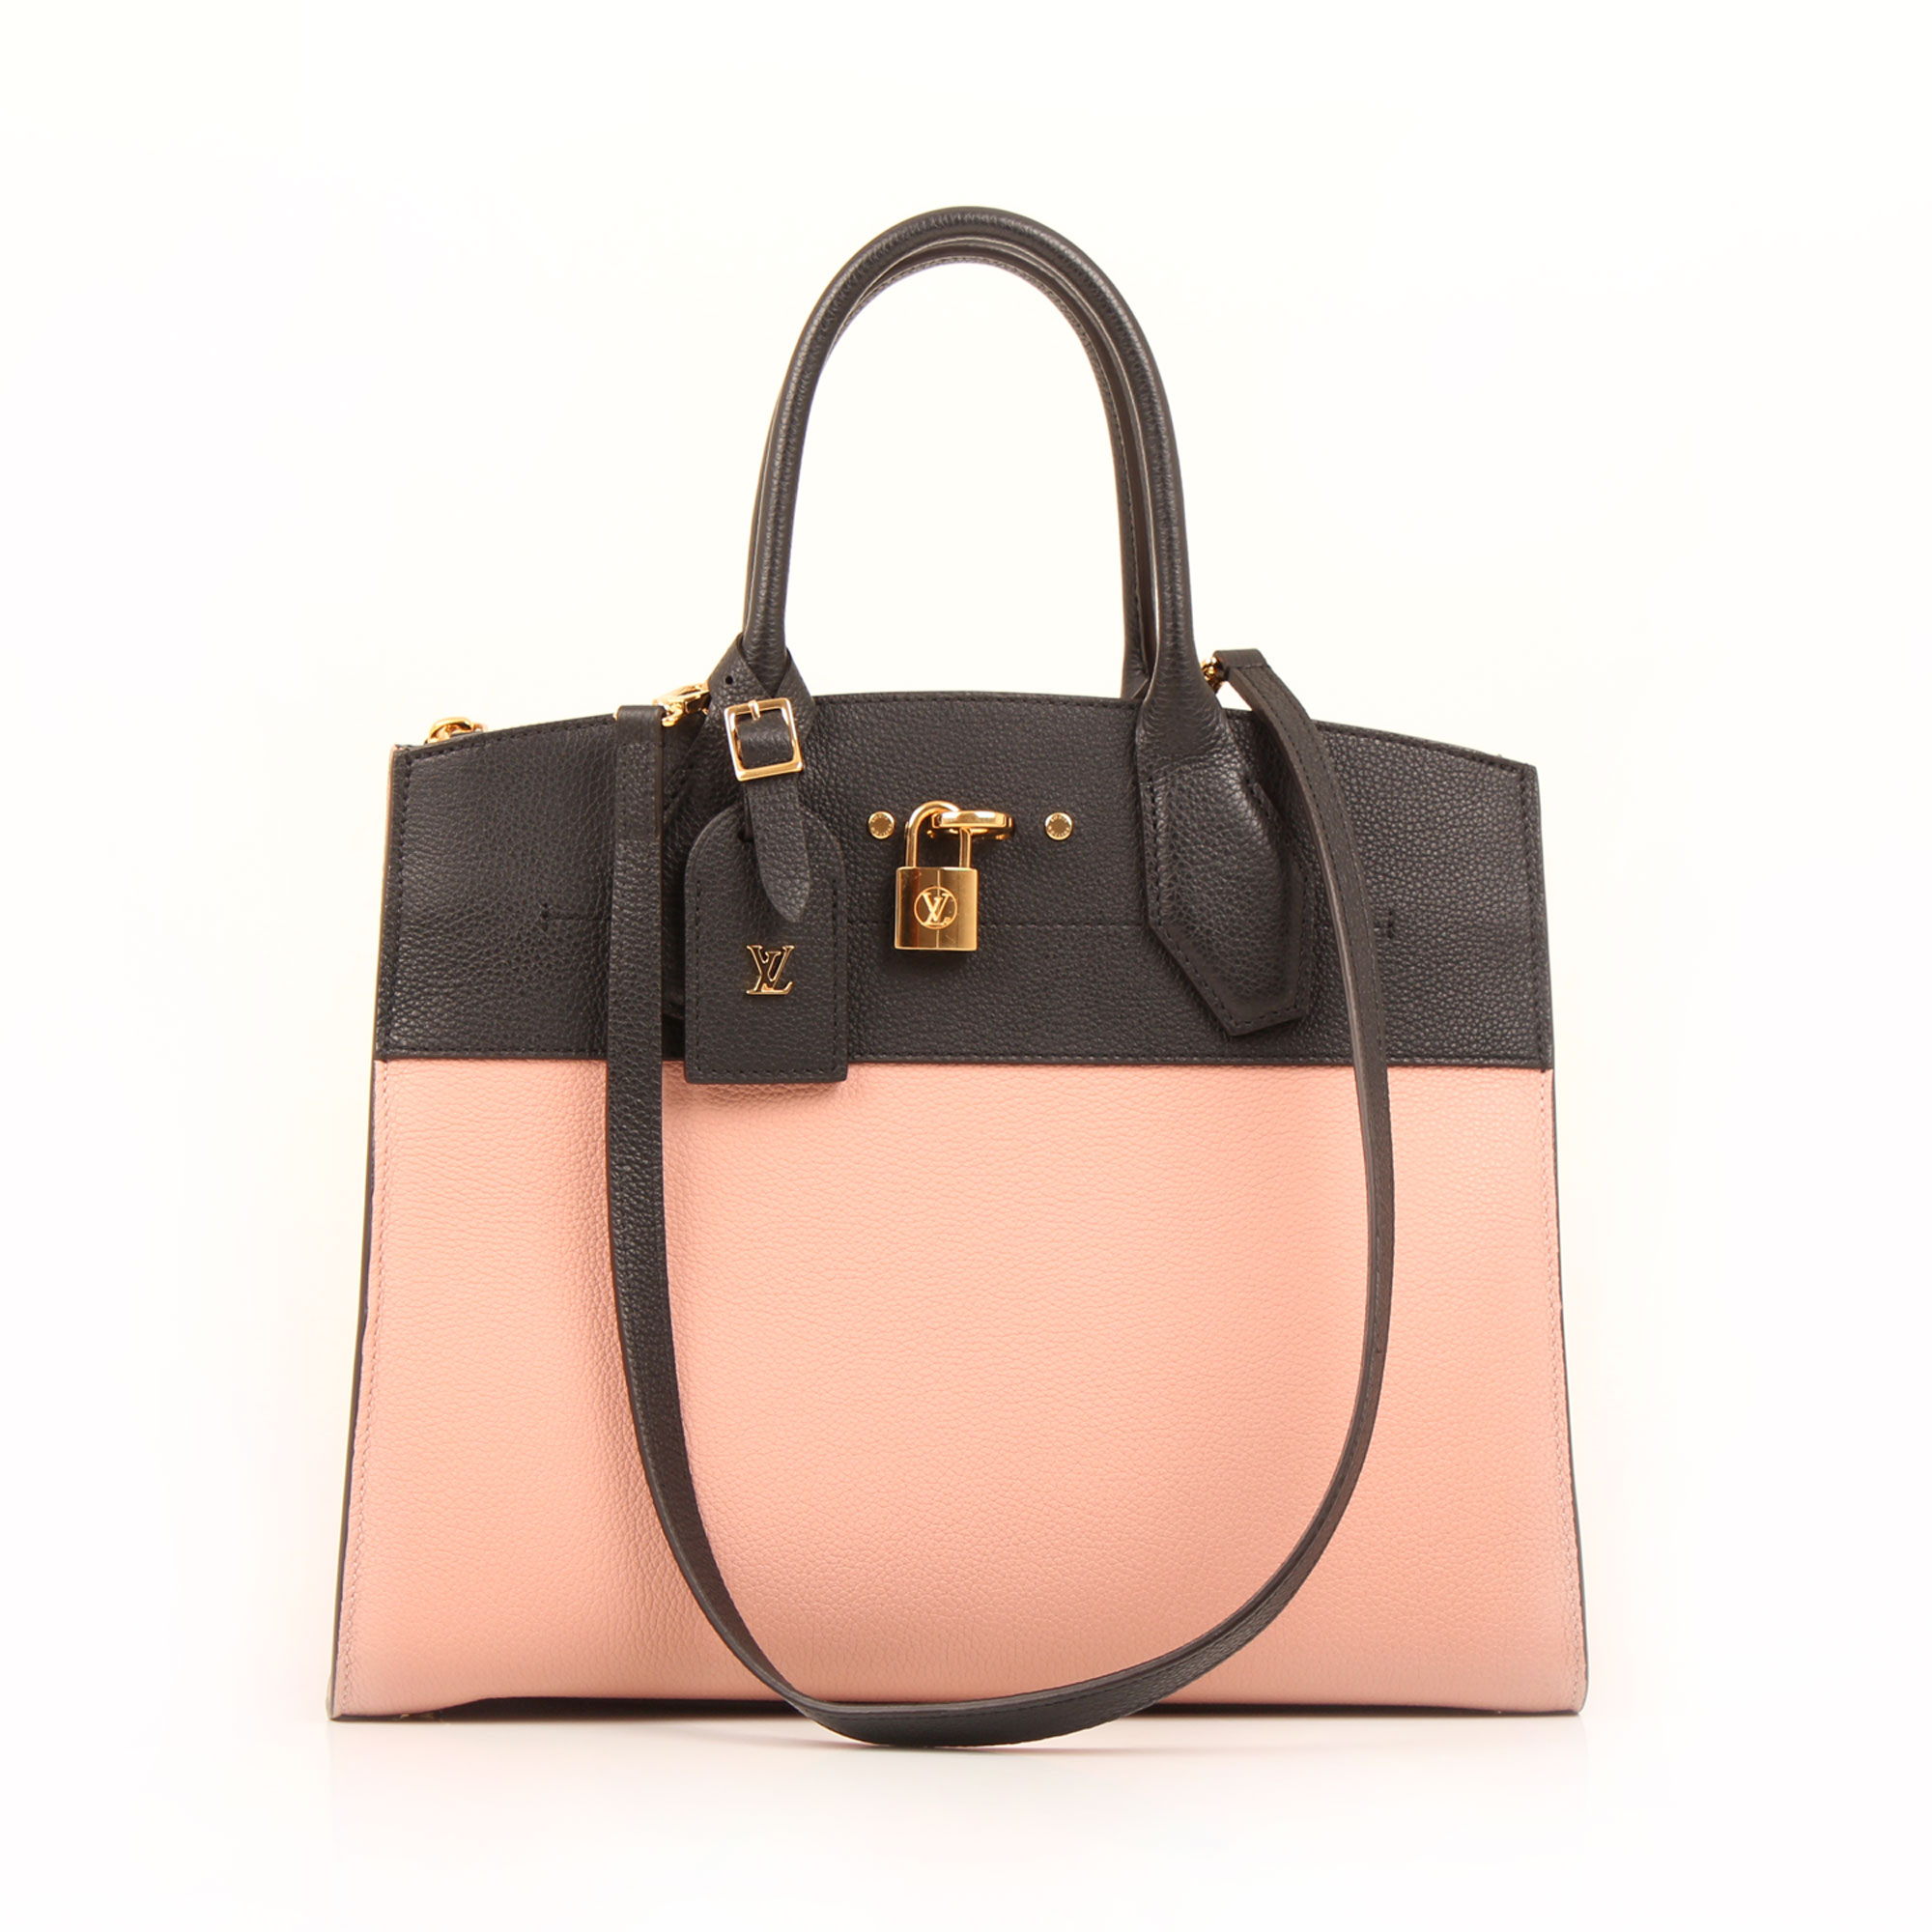 Imagen del bolso con bandolera del bolso louis vuitton city steamer mm magnolia